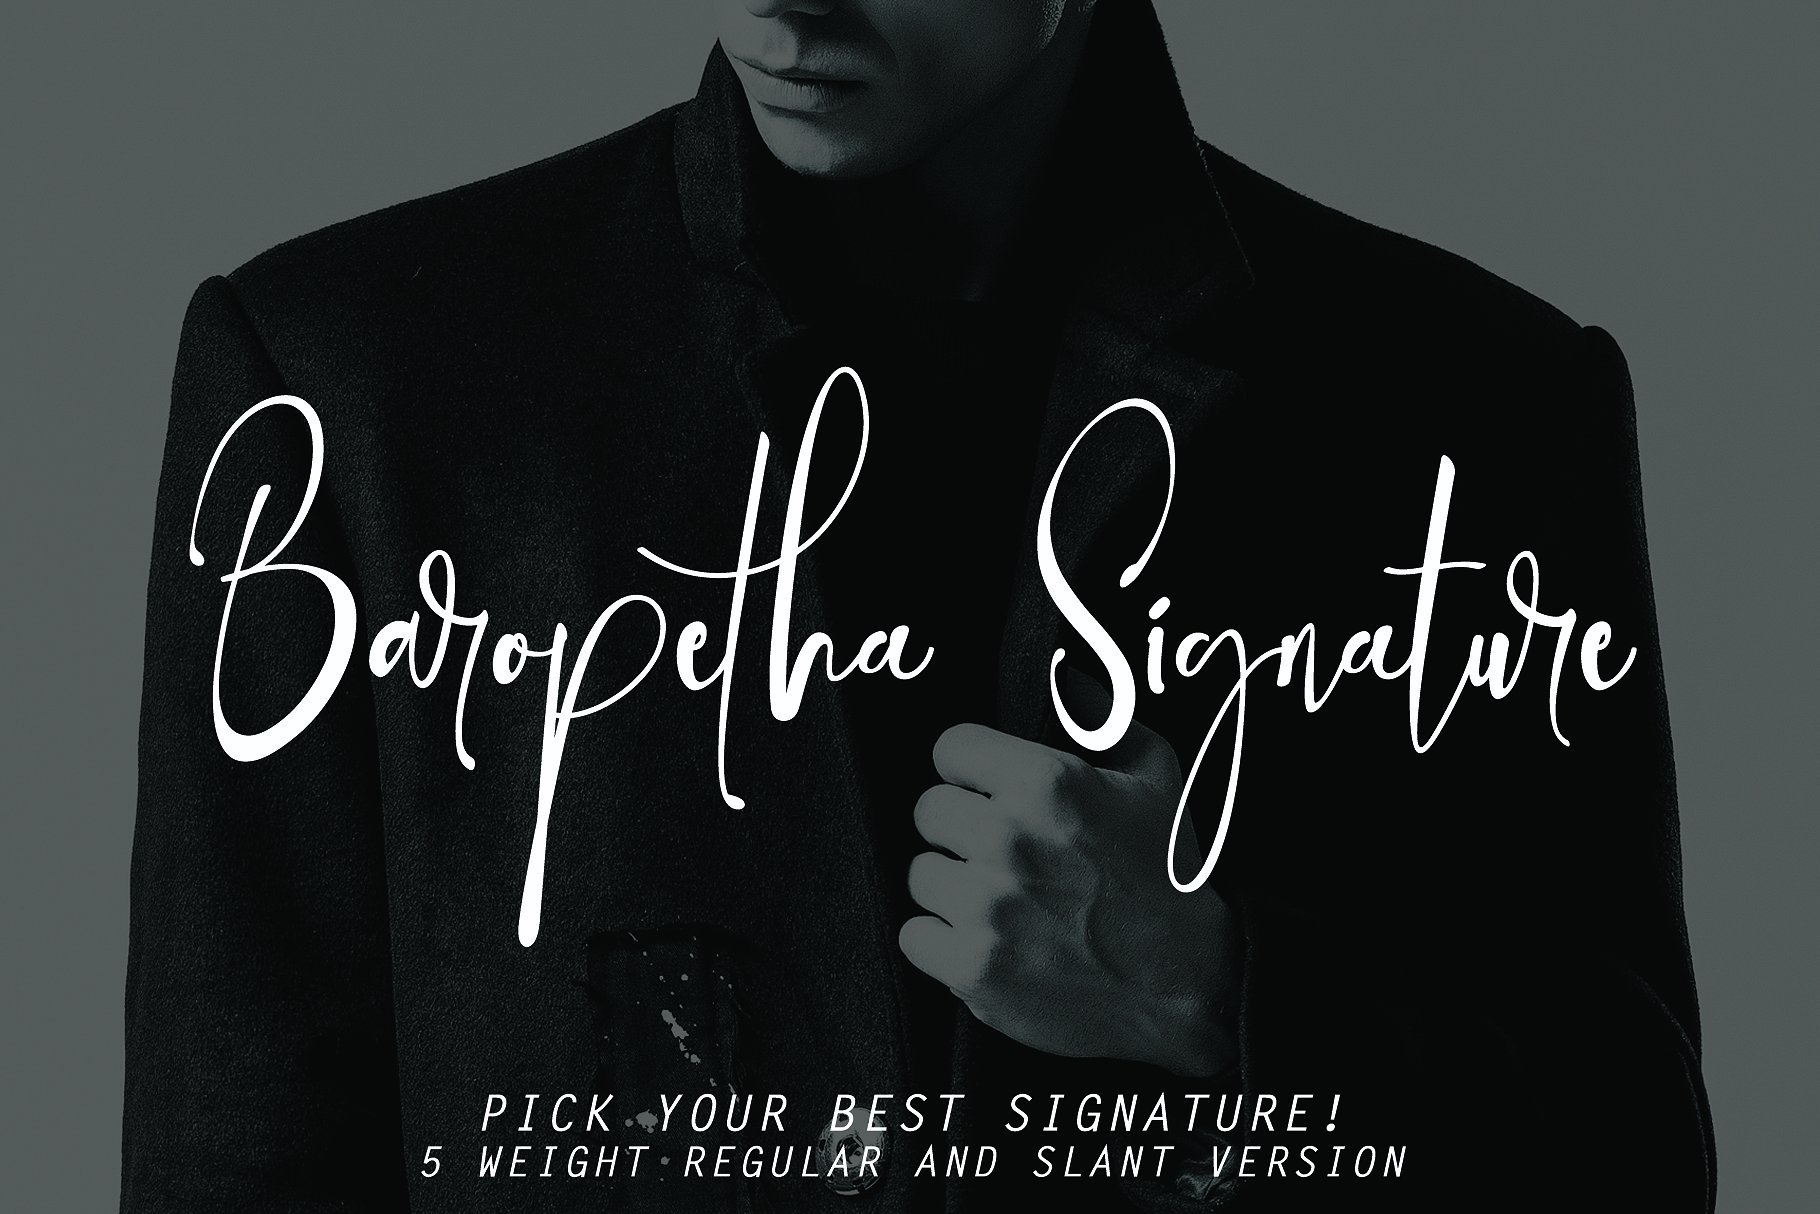 https://fontclarity.com/wp-content/uploads/2019/09/baropetha-signature-demo-font-download-0.jpg Free Download